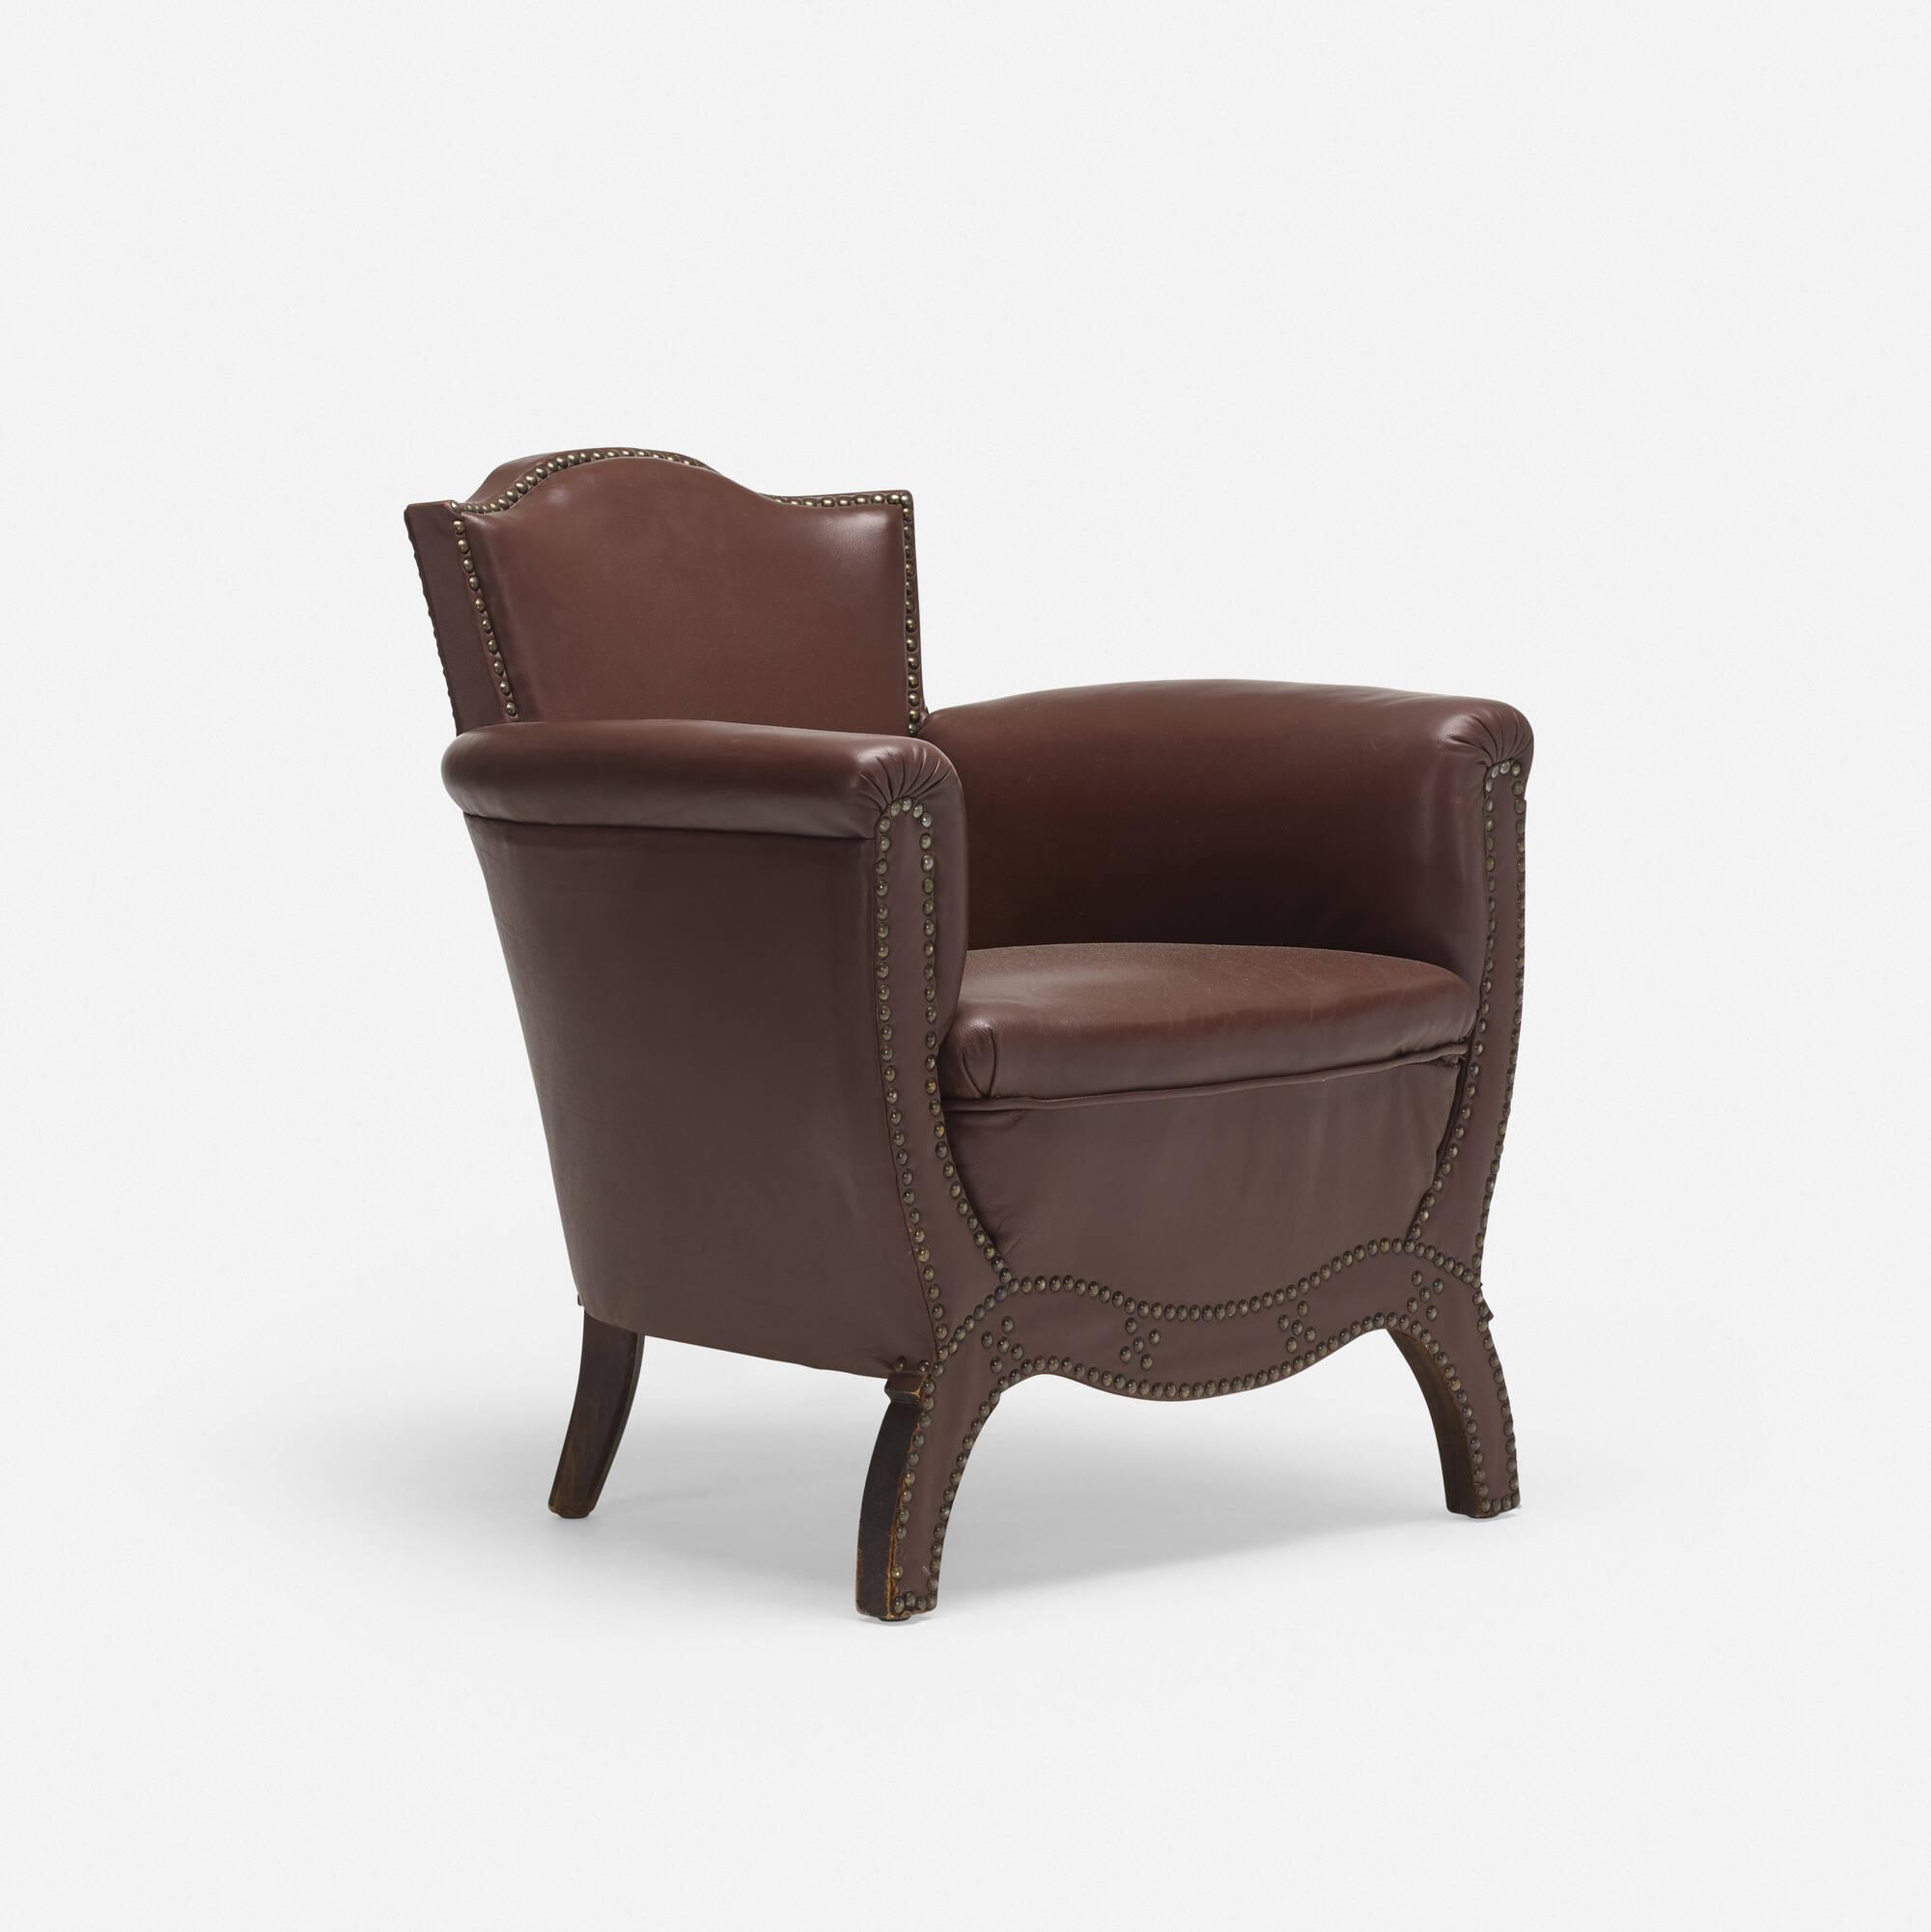 720: Otto Schulz / armchair (1 of 3)